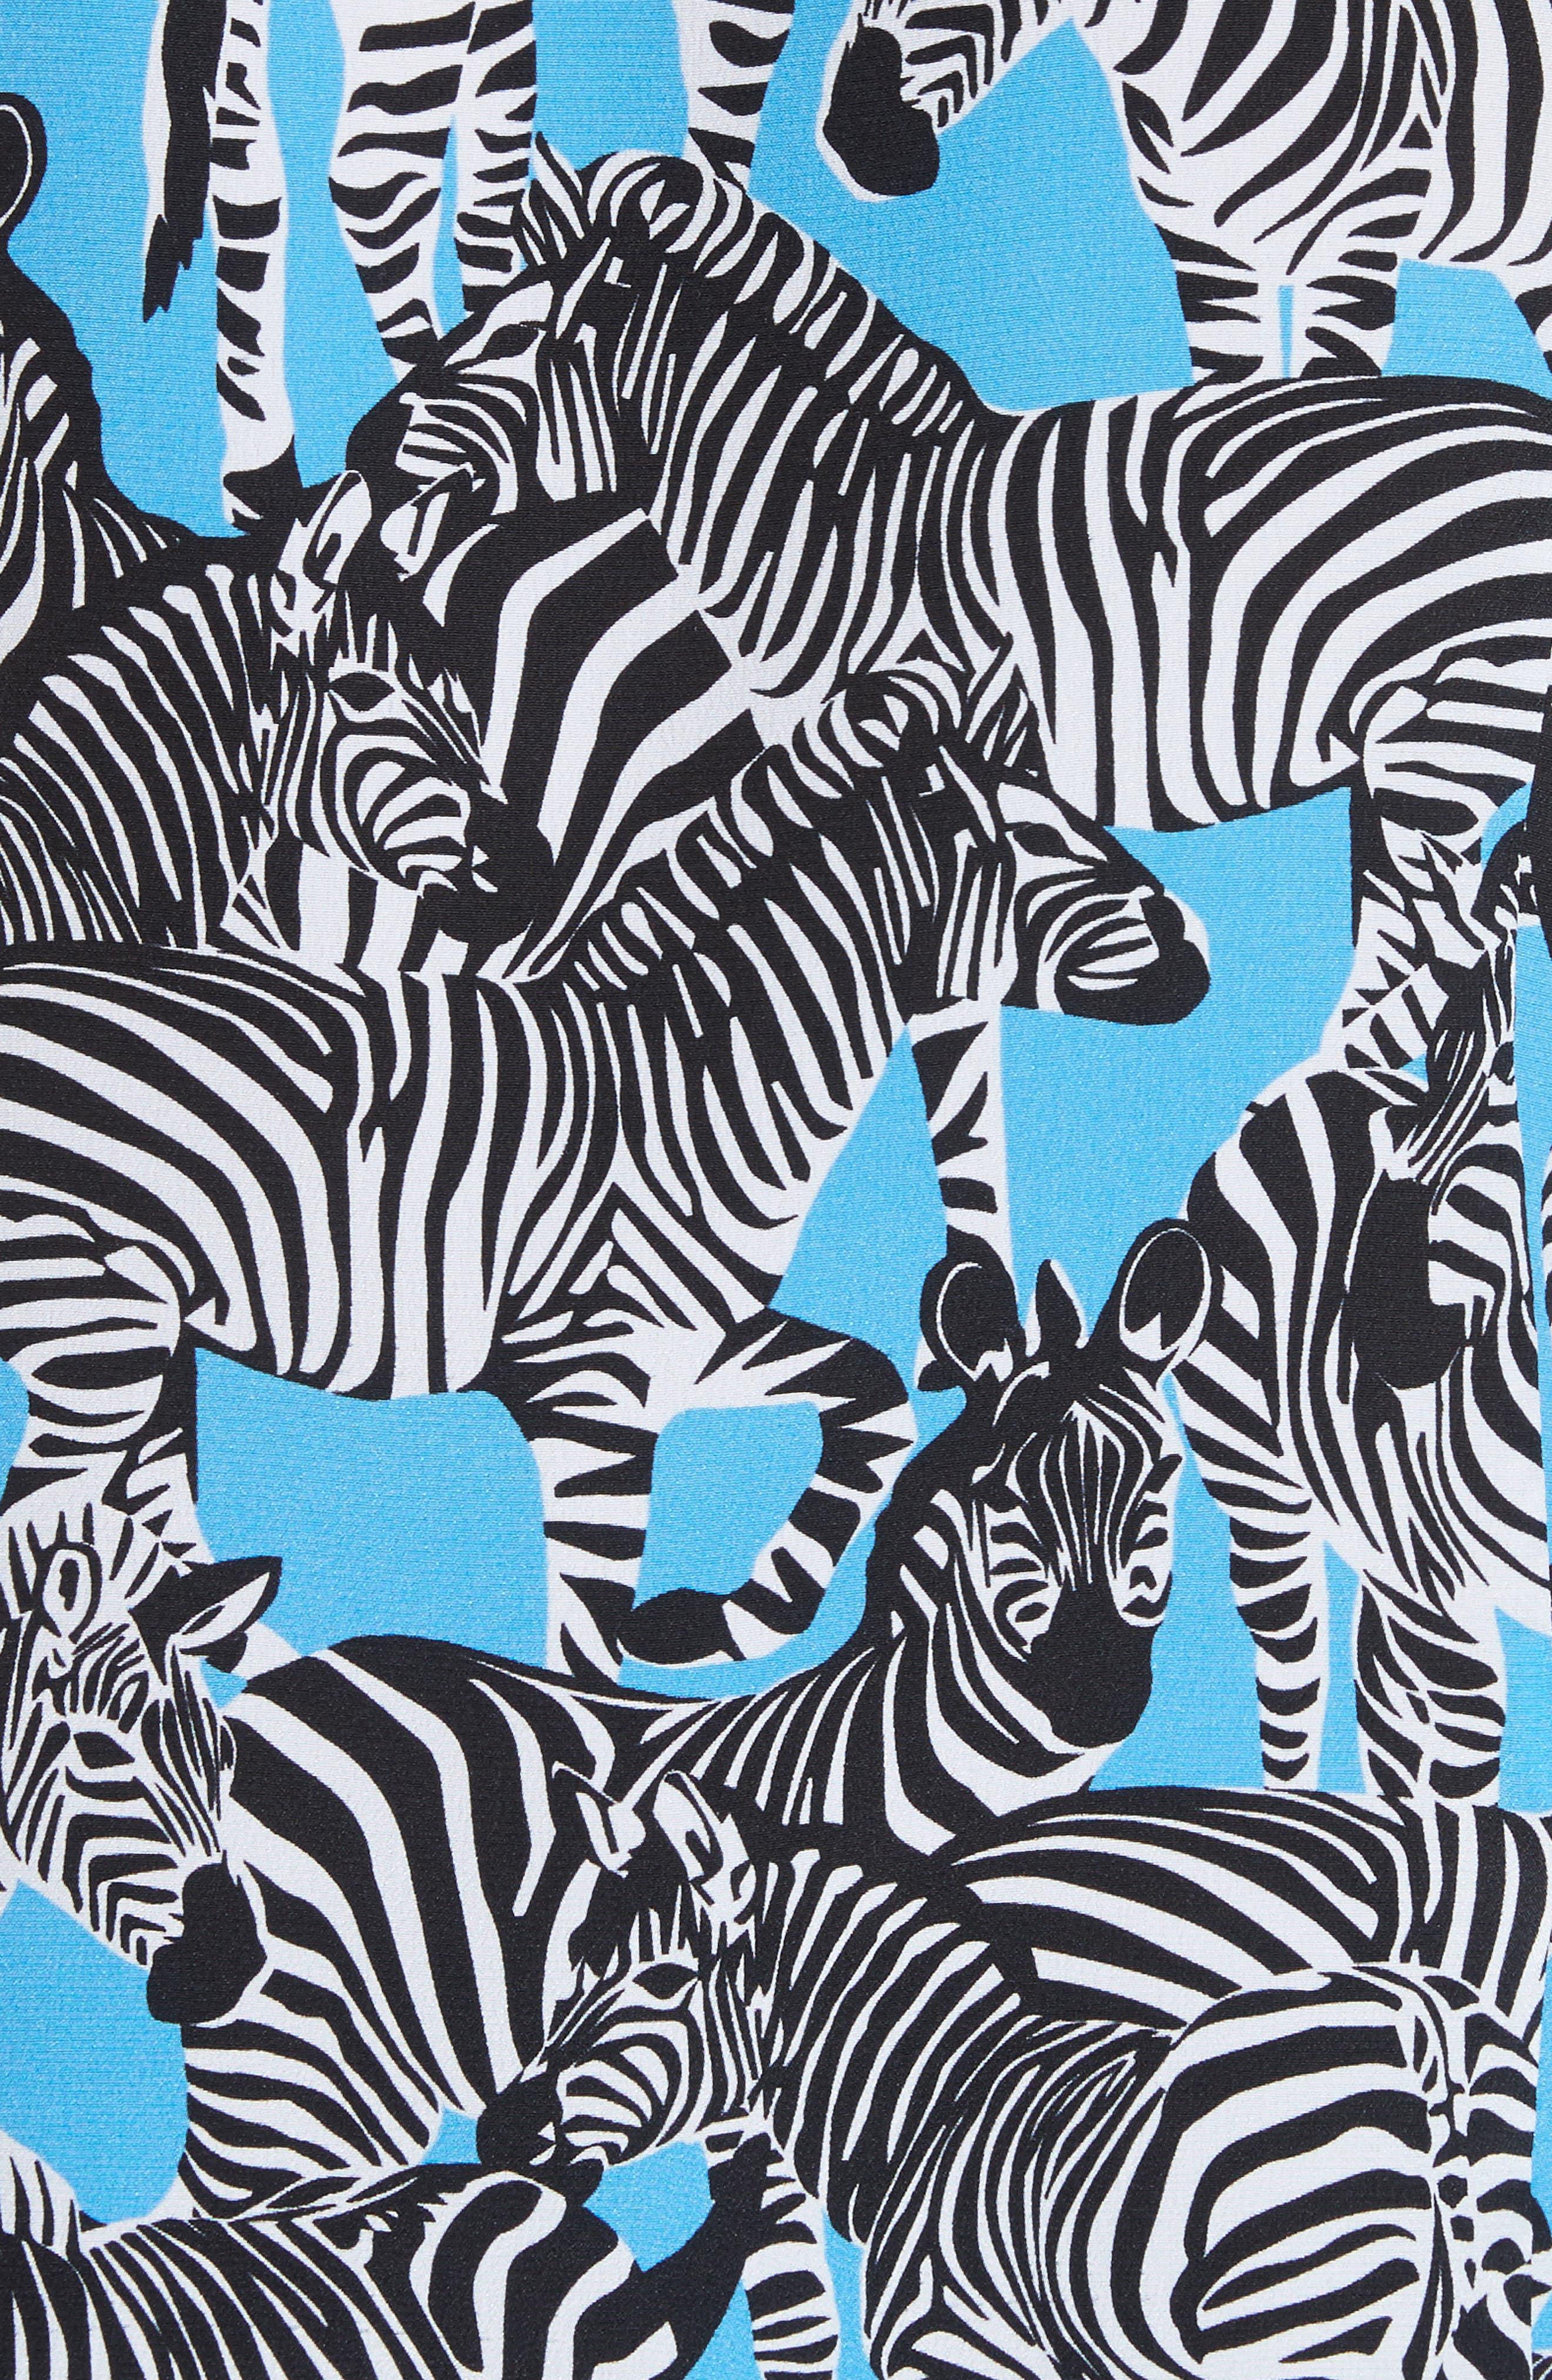 Zebra Print Crêpe de Chine Blouse,                             Alternate thumbnail 5, color,                             PORCELAIN MULTI